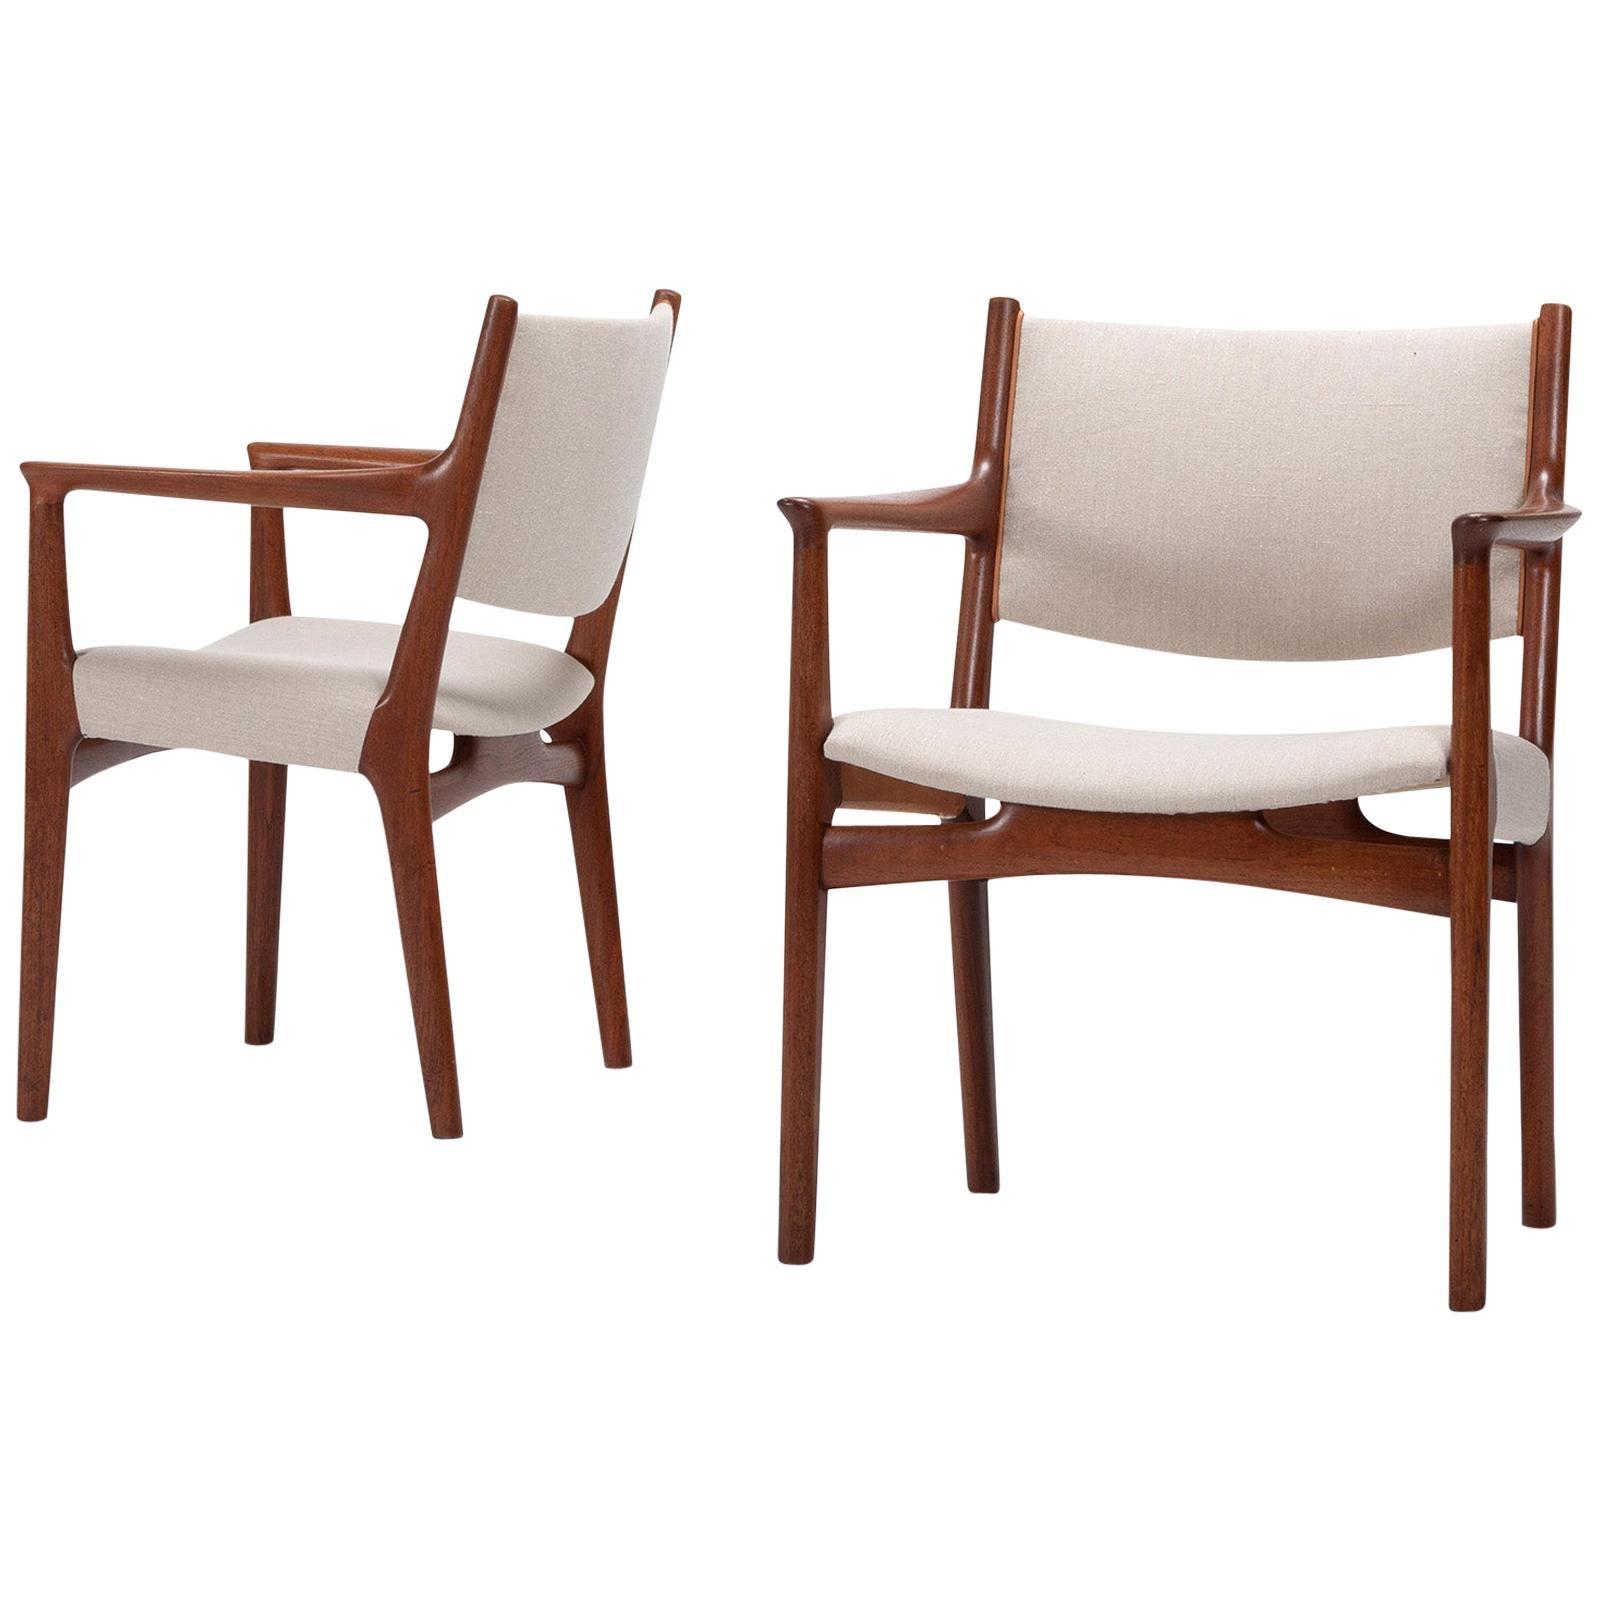 Set of 10 Chairs by Hans Wegner, Made by Cabinetmaker Johannes Hansen